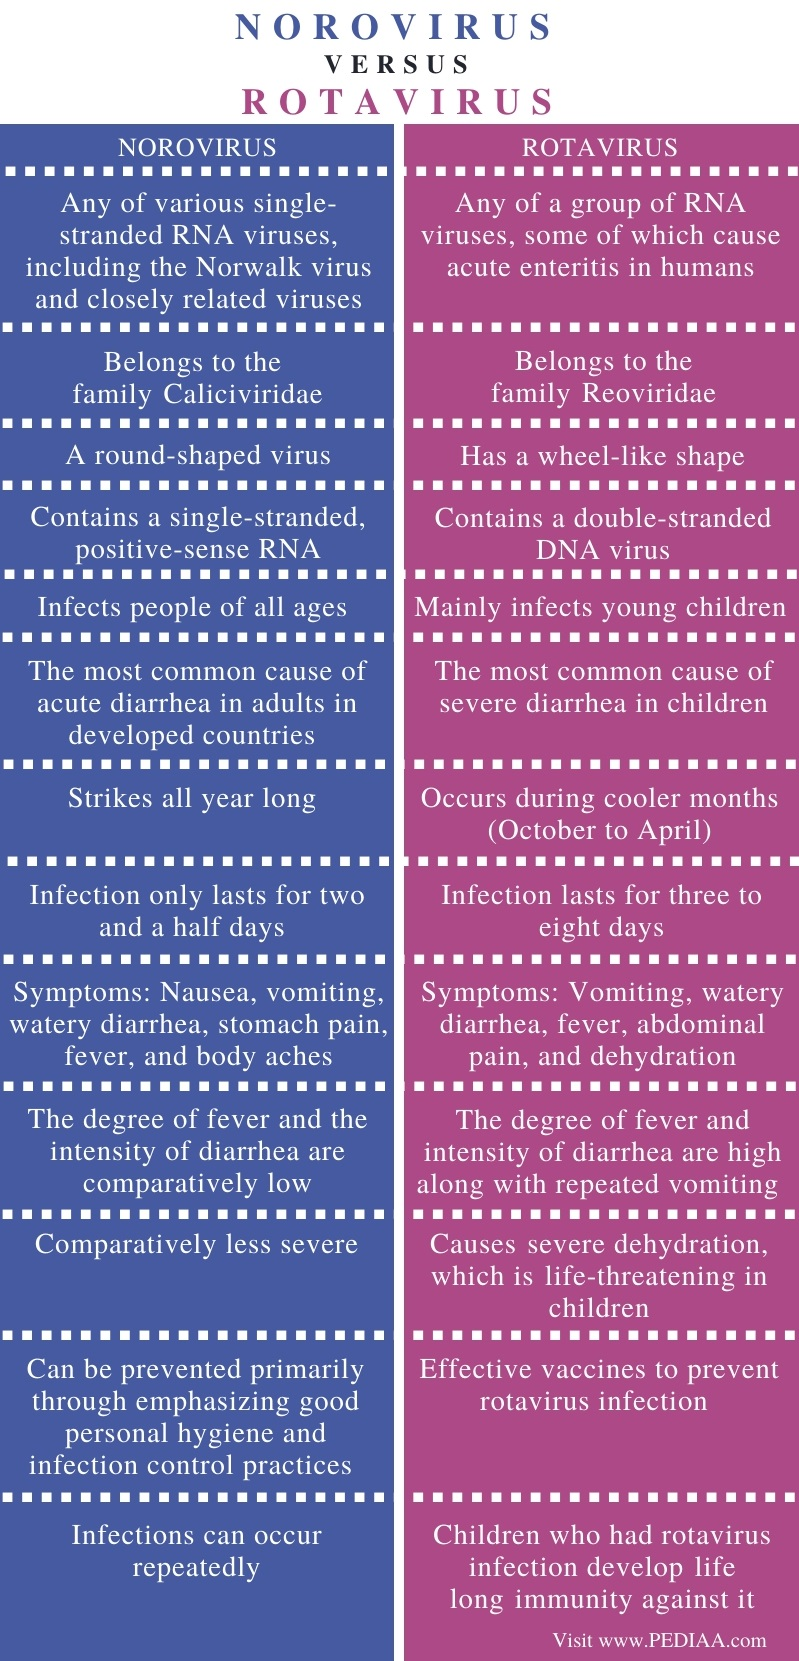 Difference Between Norovirus and Rotavirus - Comparison Summary